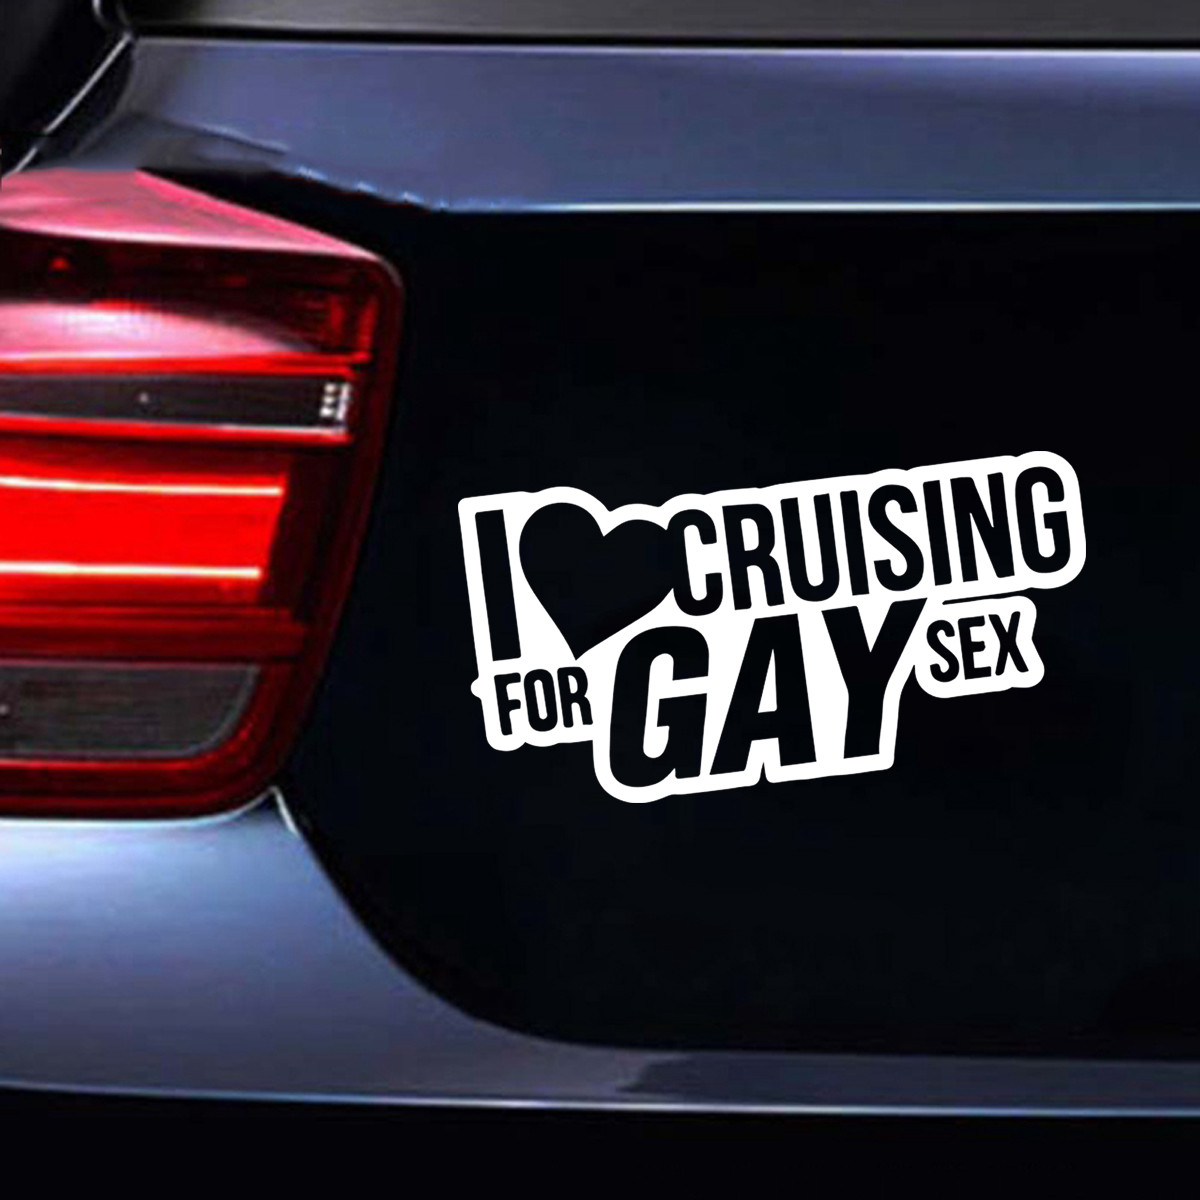 Details about i love cruising for gay sex car window door laptop bumper vinyl decal sticker